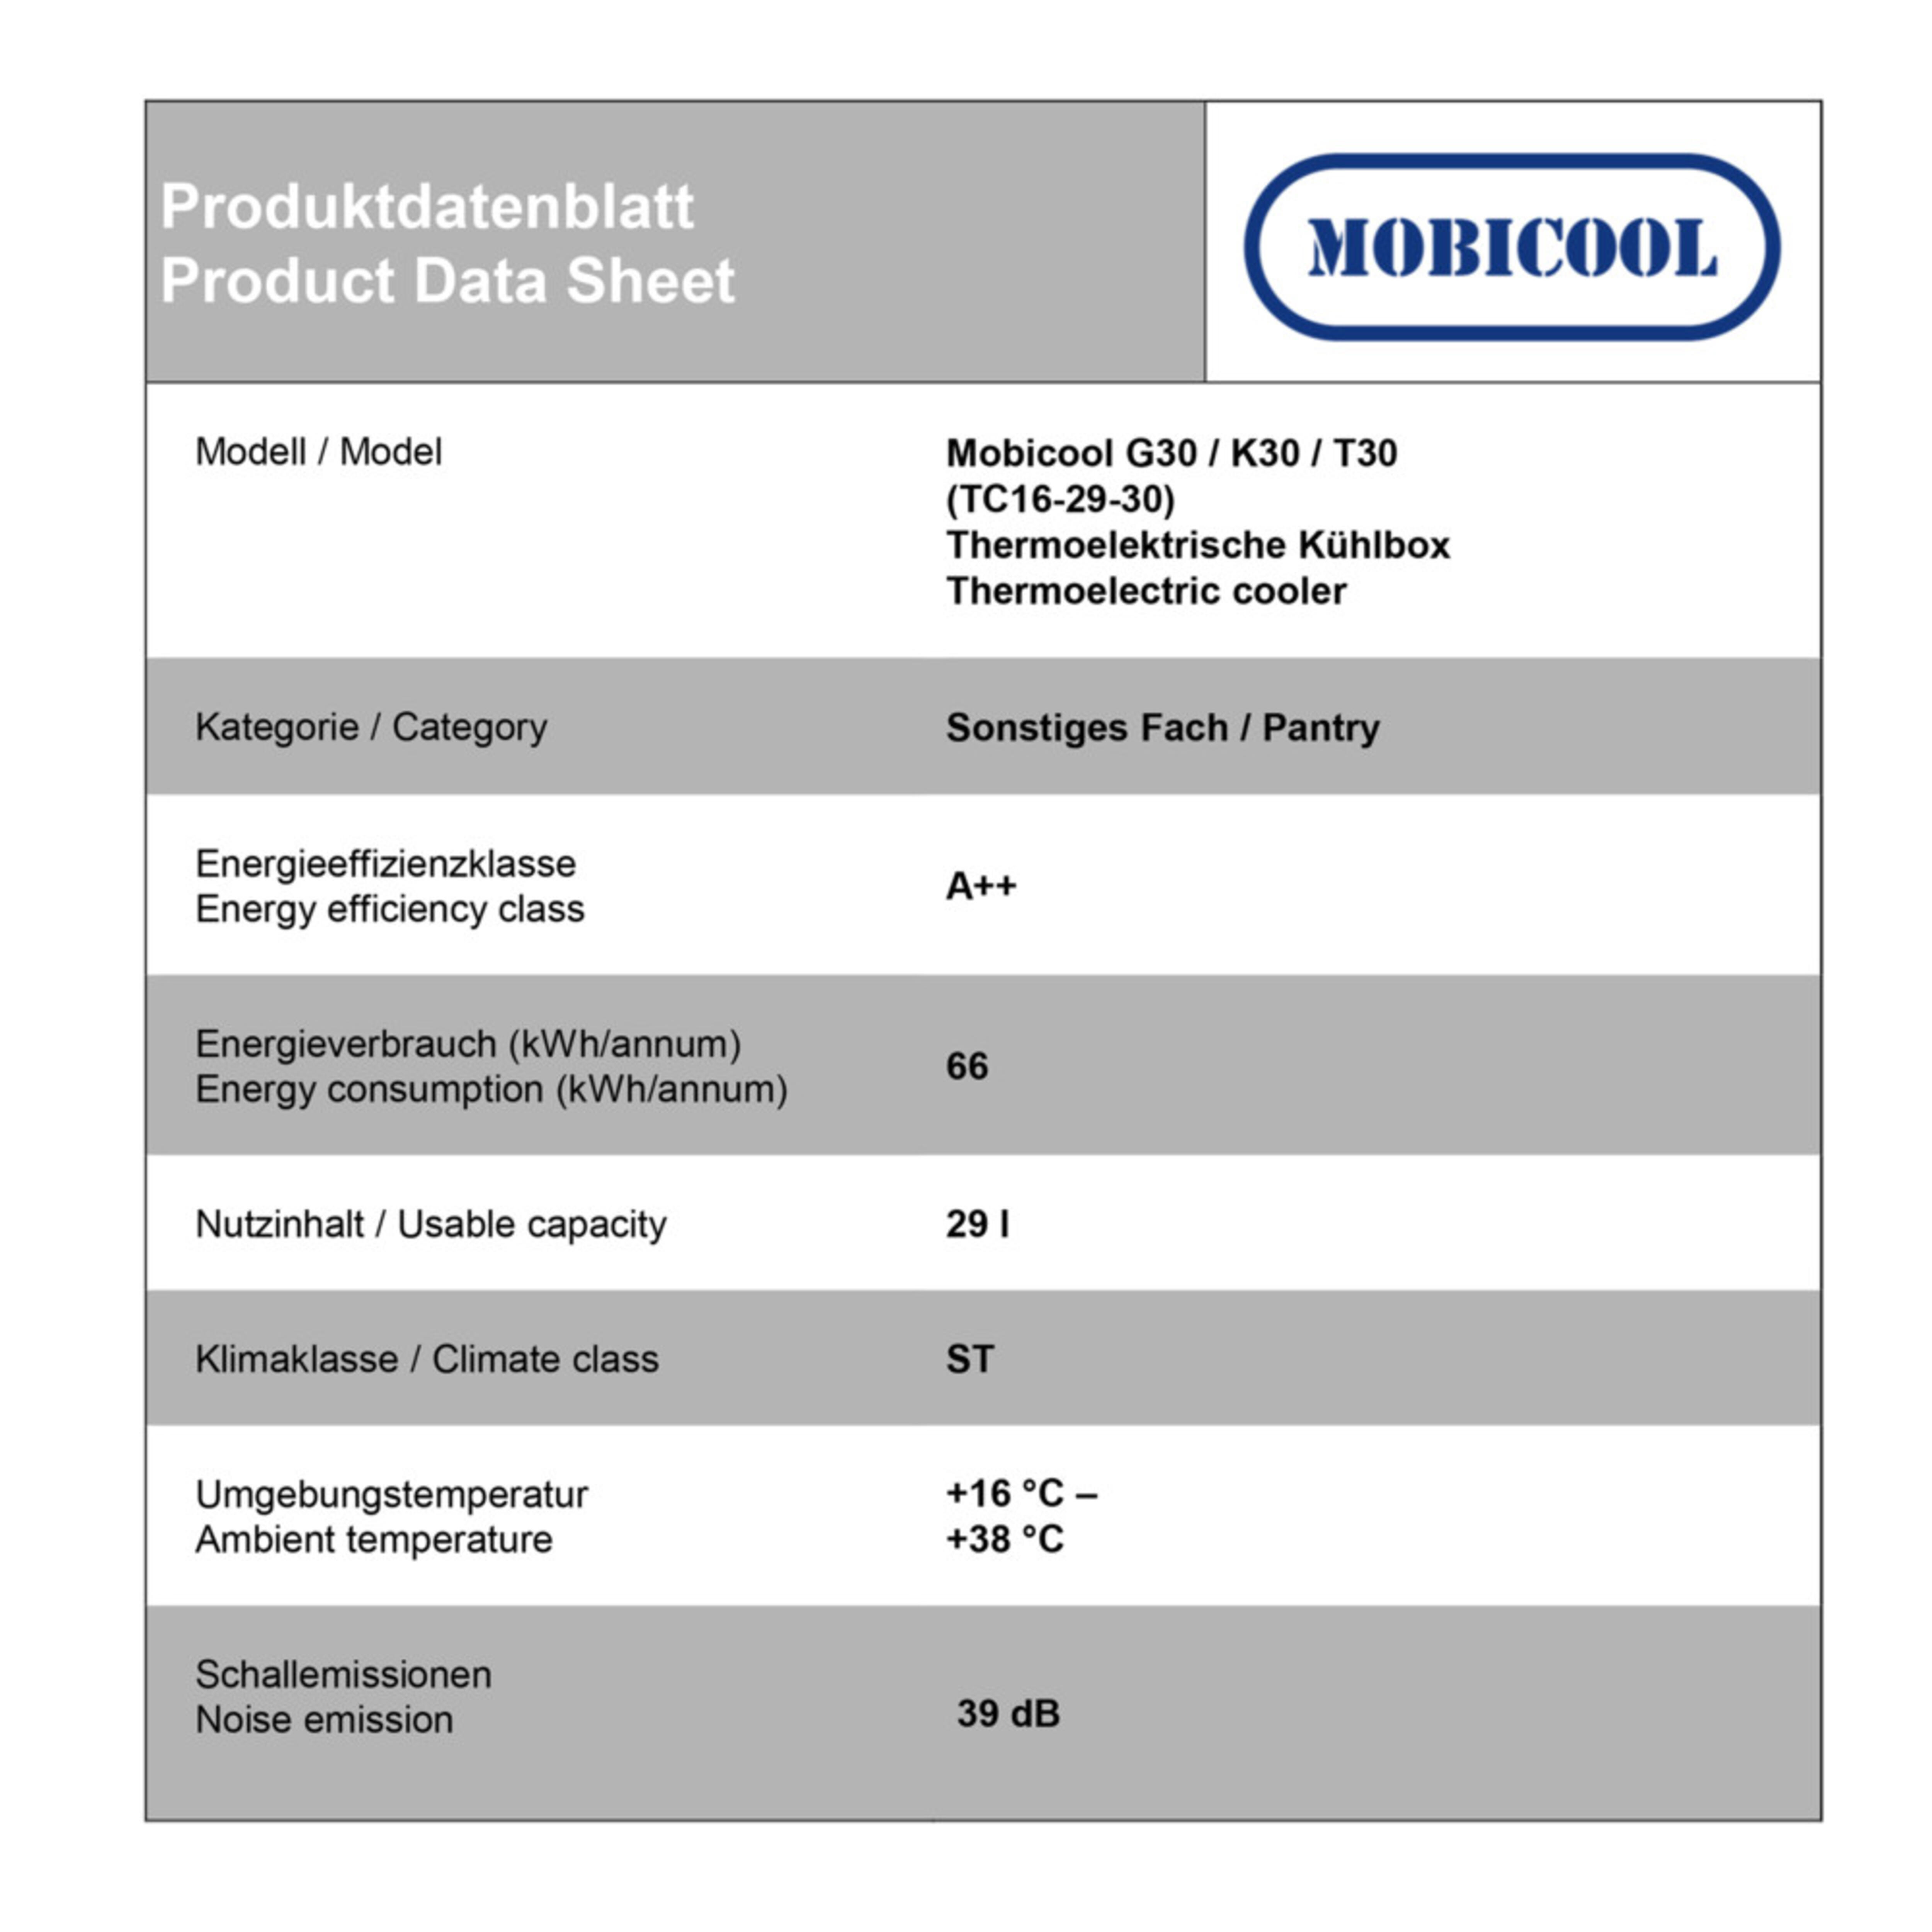 Mobicool T30 AC/DC Energy data sheet